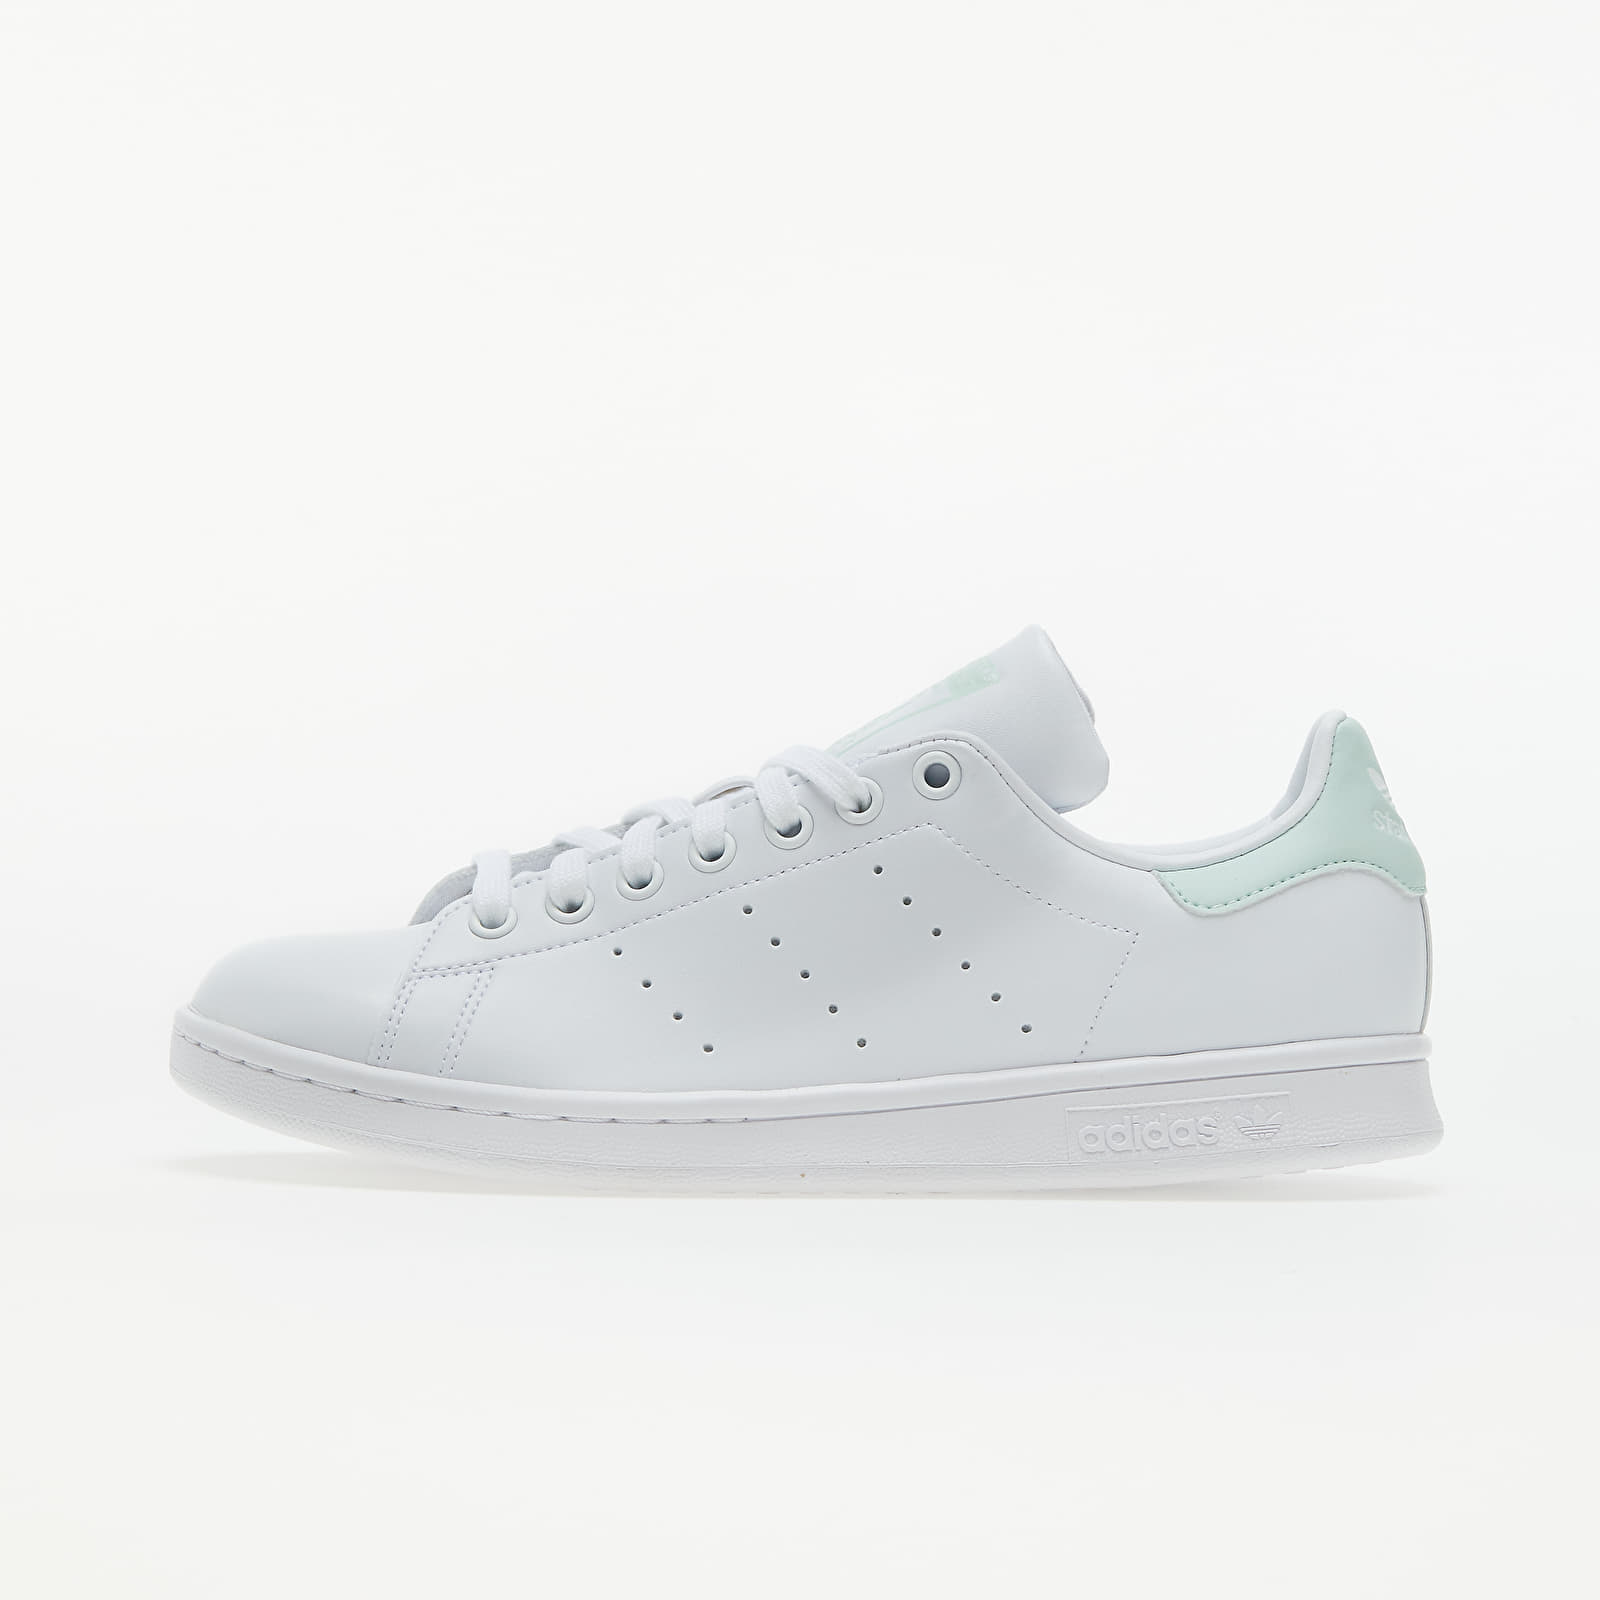 adidas Stan Smith W Ftw White/ Dash Green/ Core Black G58186